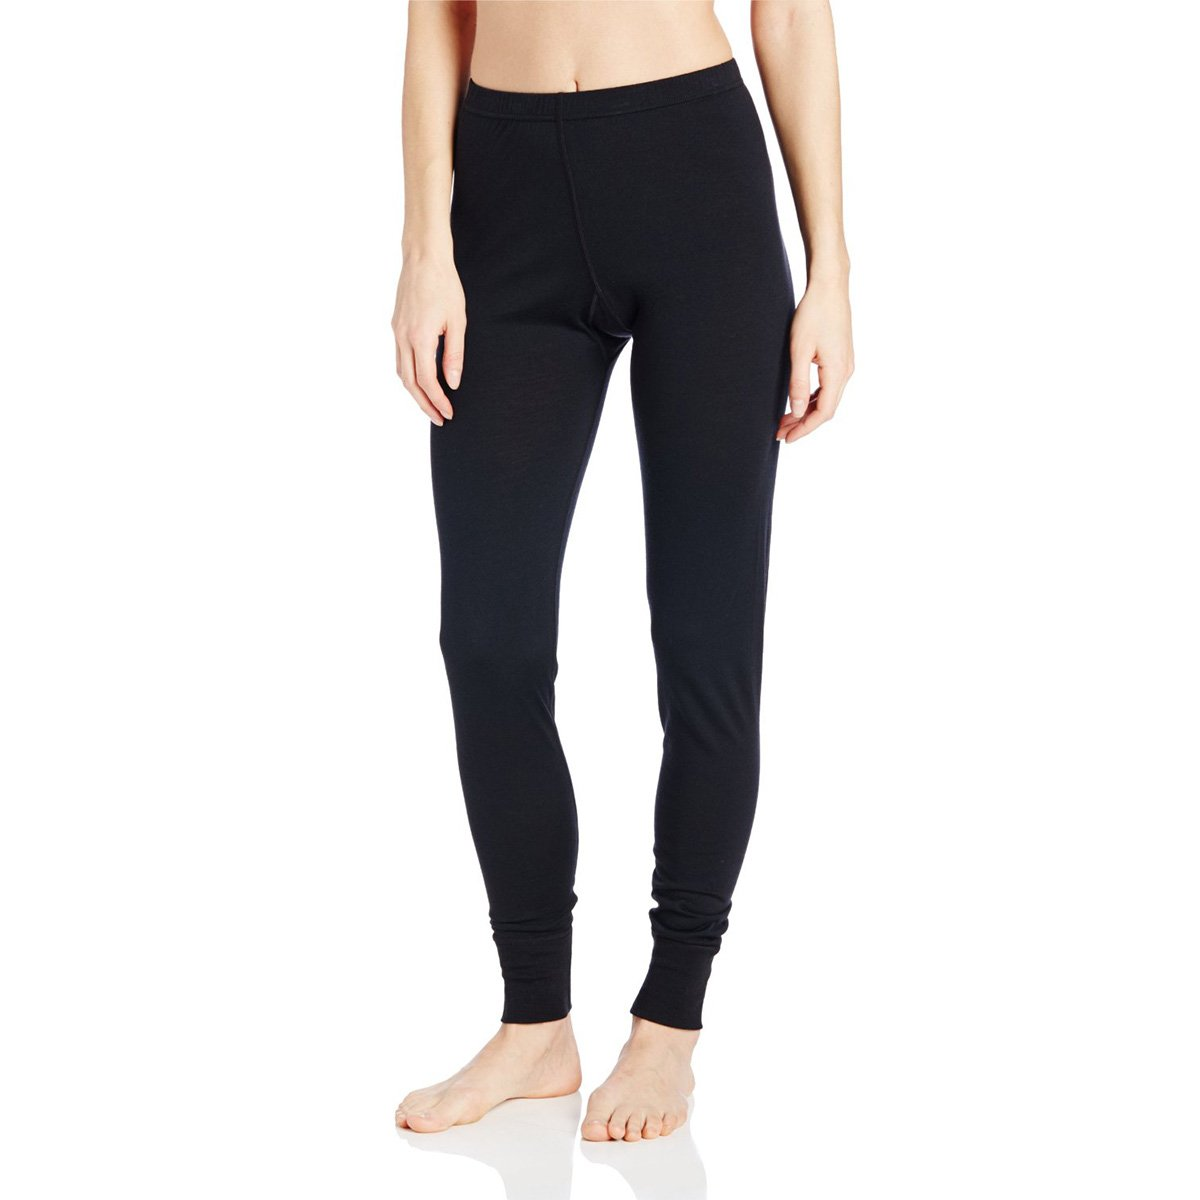 Minus33 Merino Wool Women's Magalloway Lightweight Bottom, Black, Large